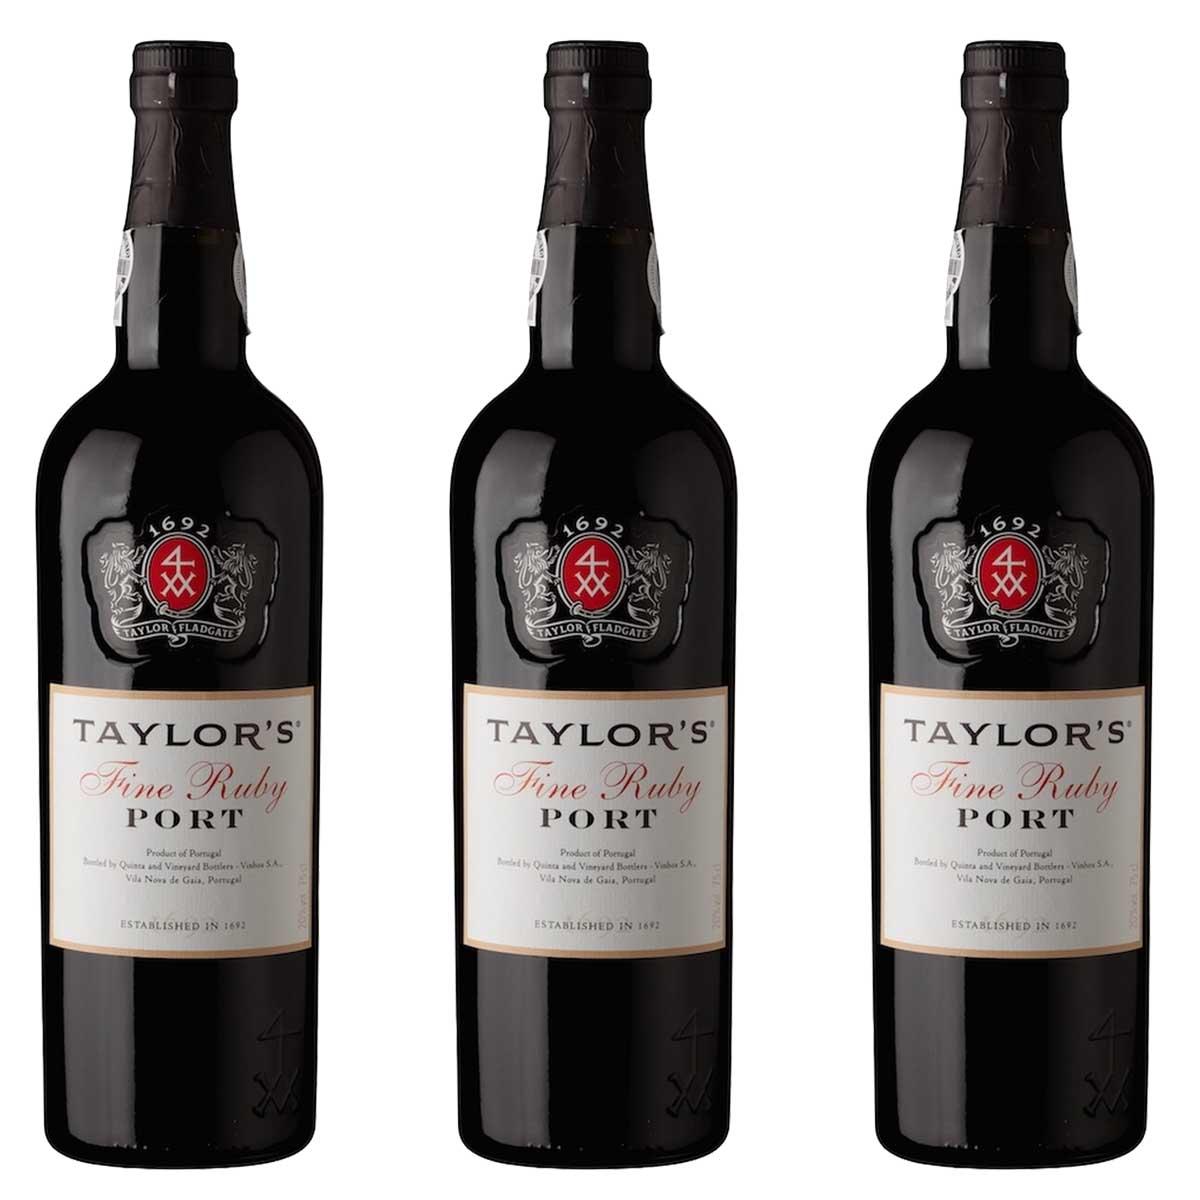 Kit 3x Vinho do Porto Tinto Ruby Taylor's Português